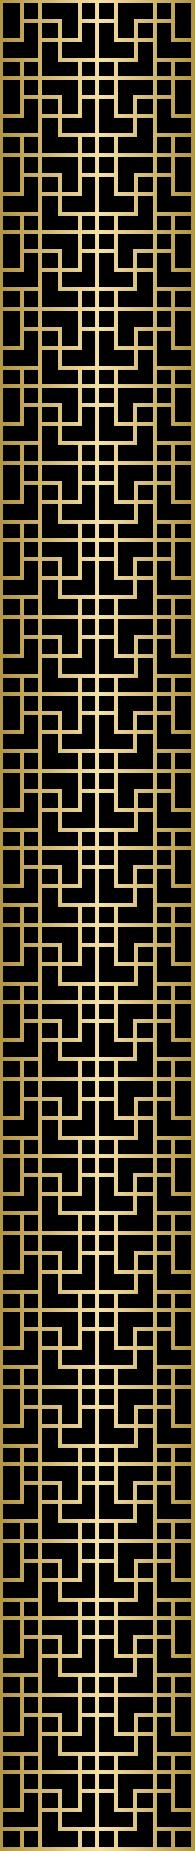 bg-gold-bar-long.png